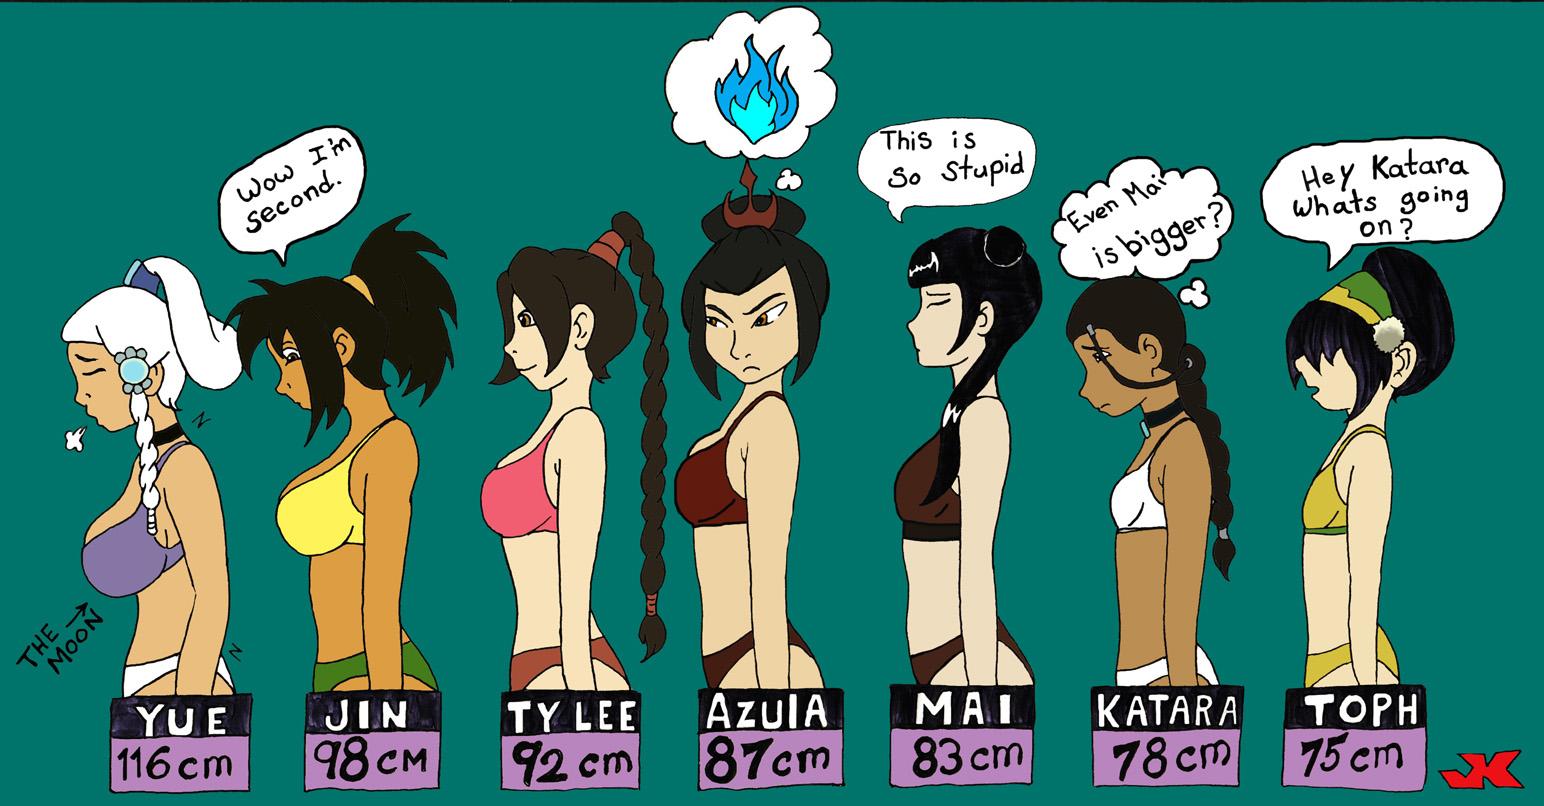 Avatar The Last Airbender Sex Pics 94